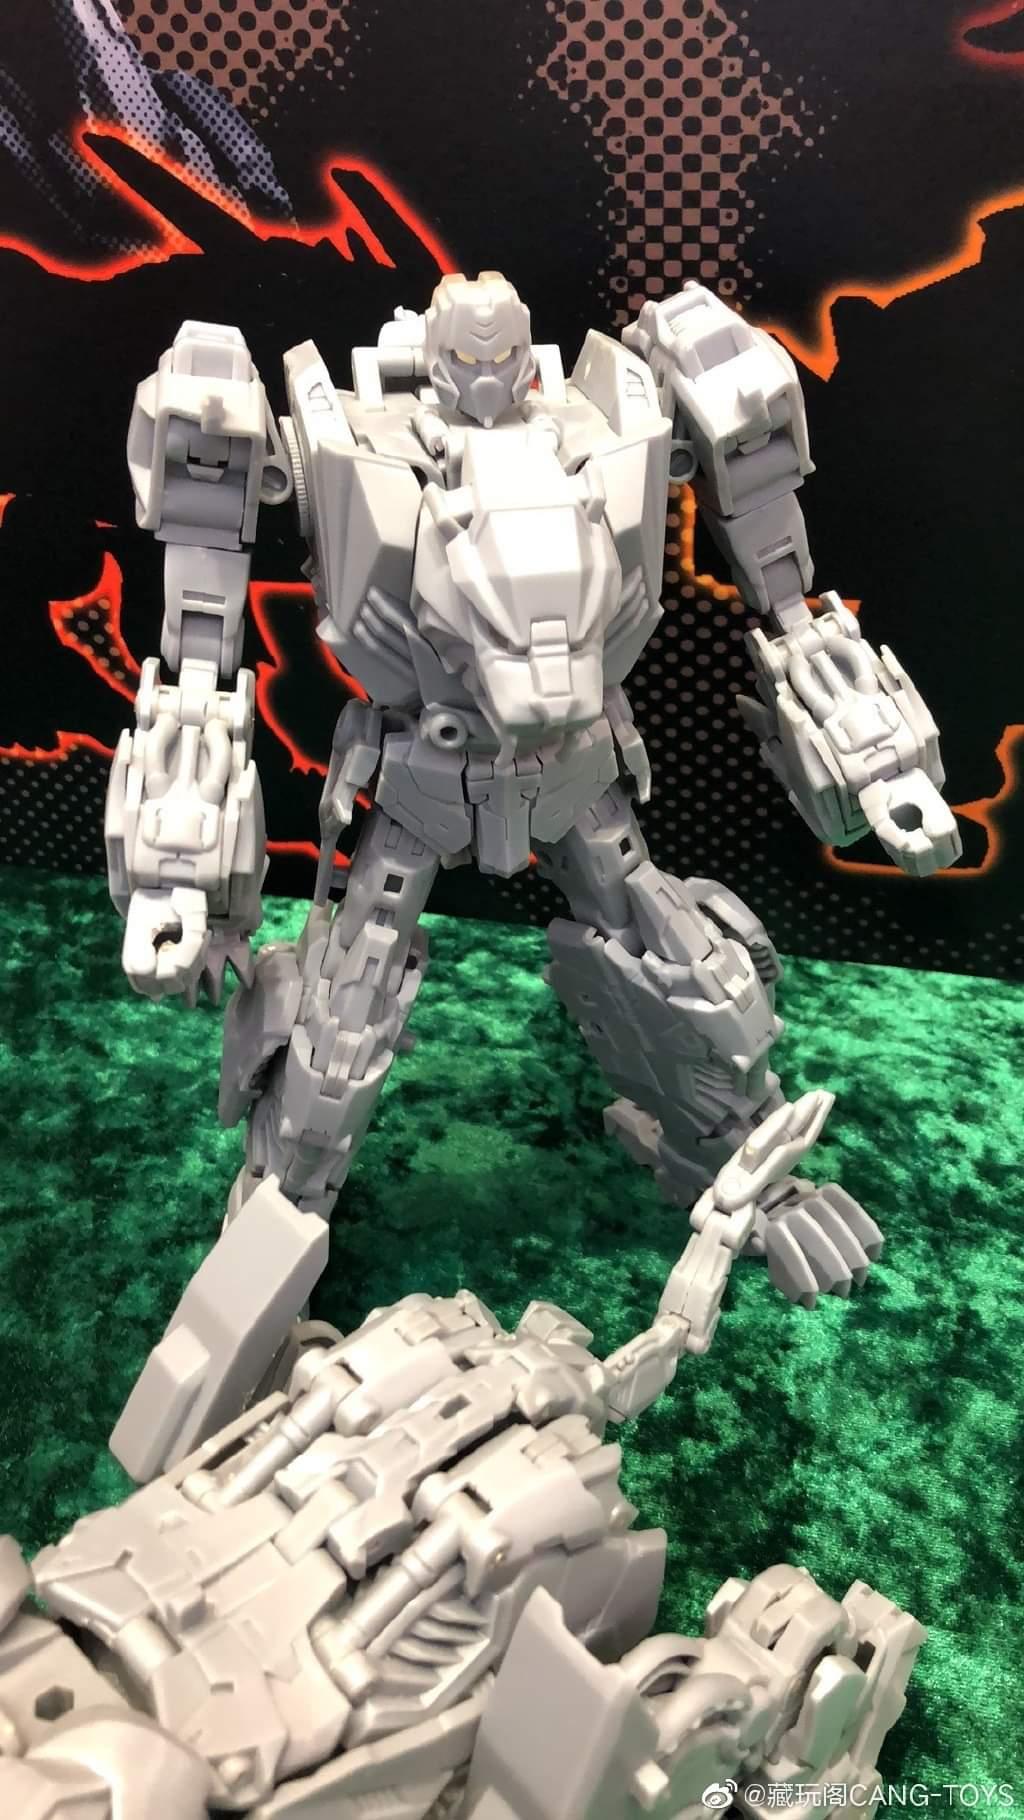 [Toyworld][Cang-Toys] Produit Tiers - Thunderking/Chiyou - aka Predaking/Prédaroi (Prédacons) XdfT10U6_o